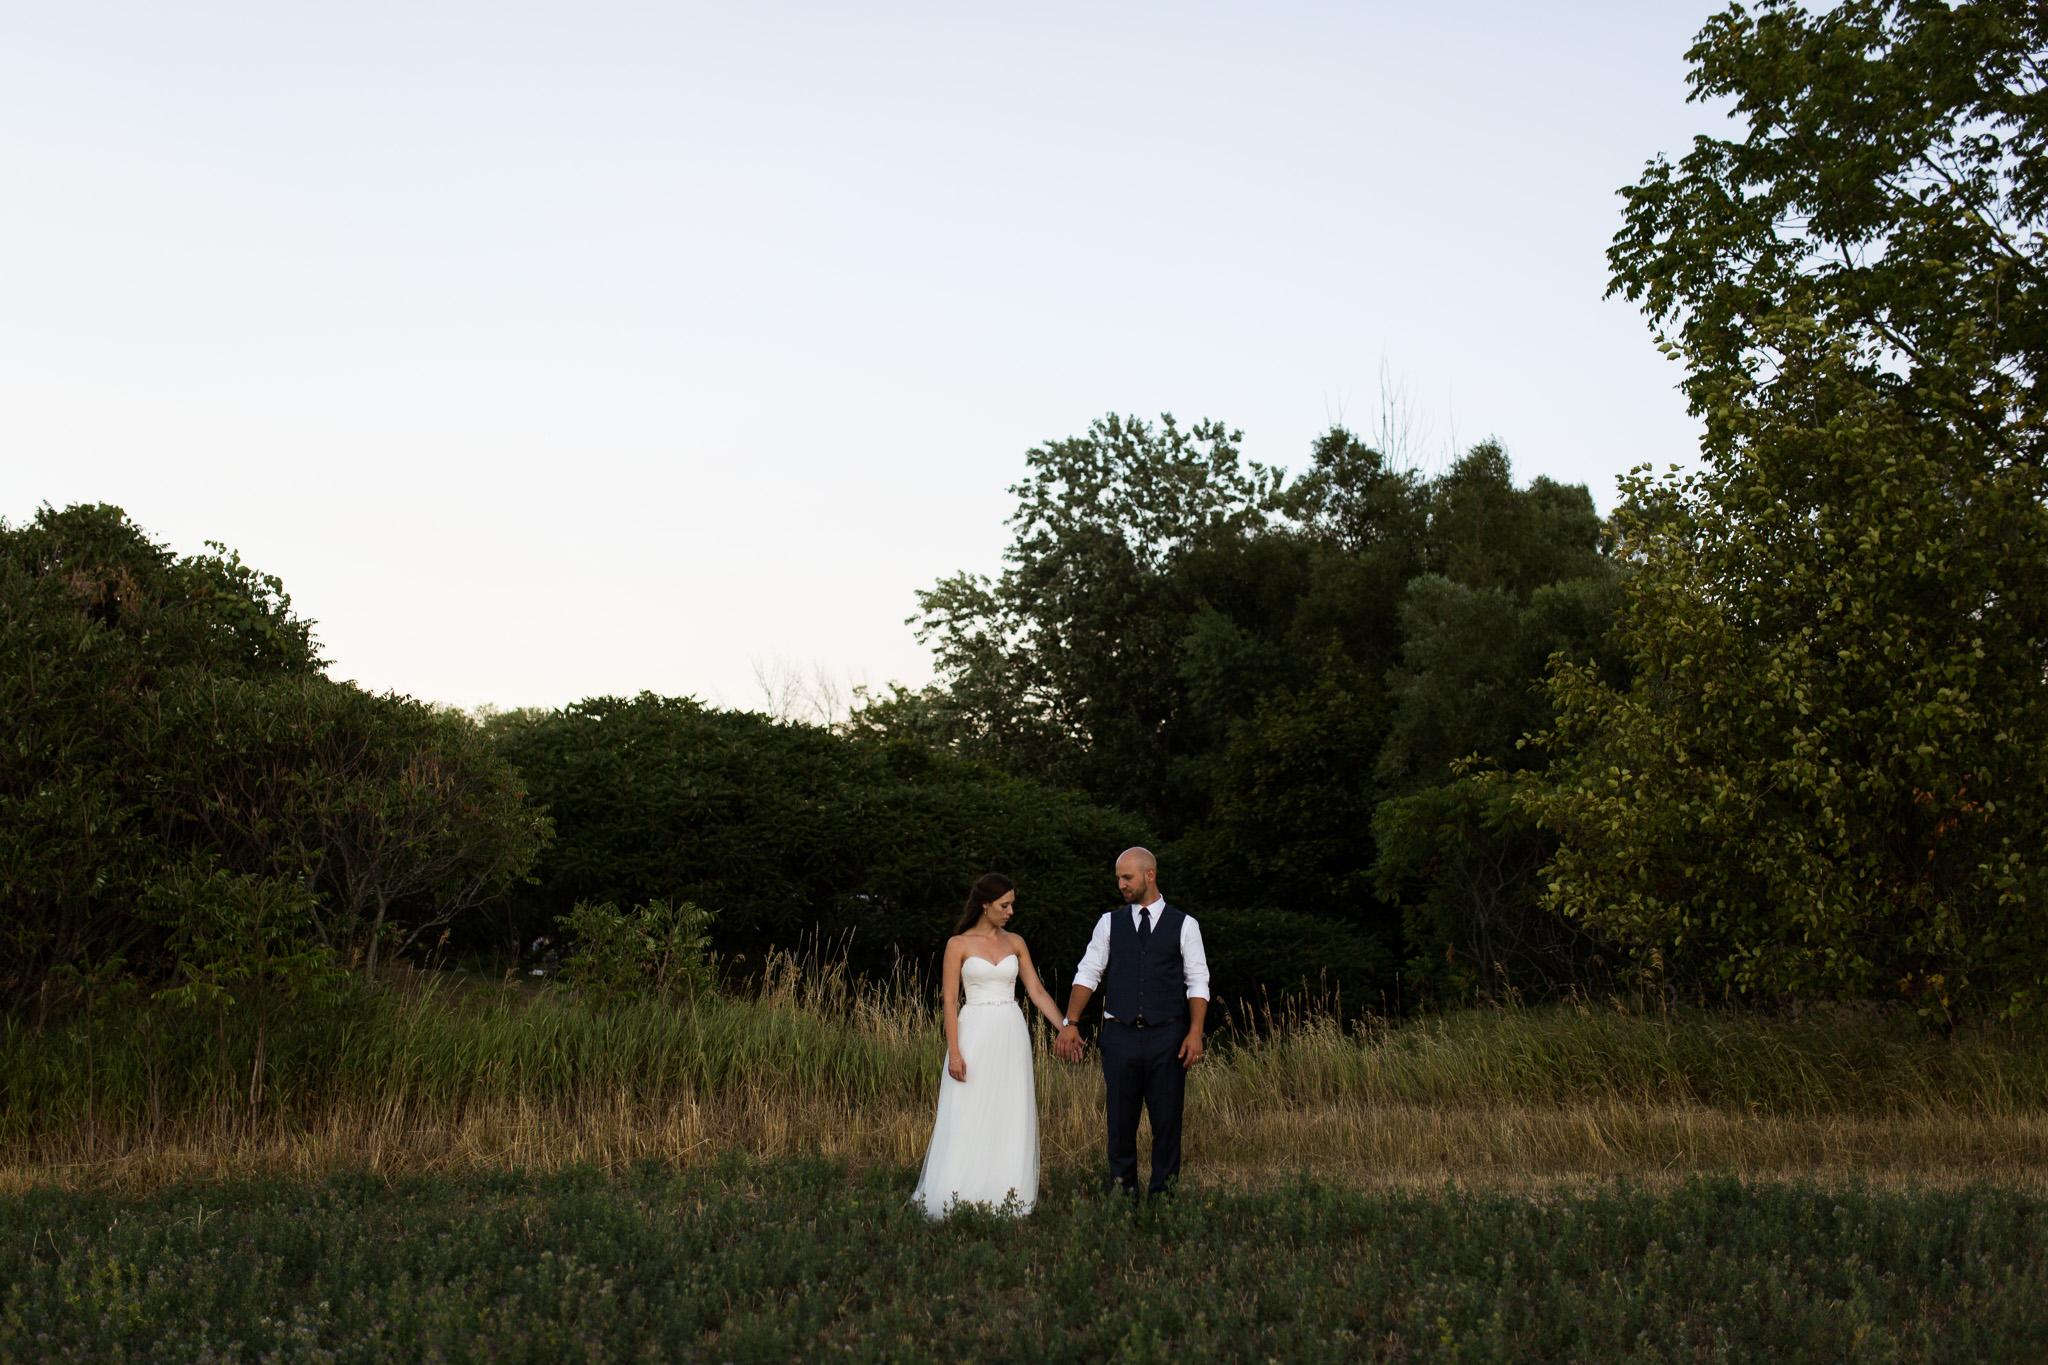 springer-house-burlington-wedding-photographer-613-of-756.jpg